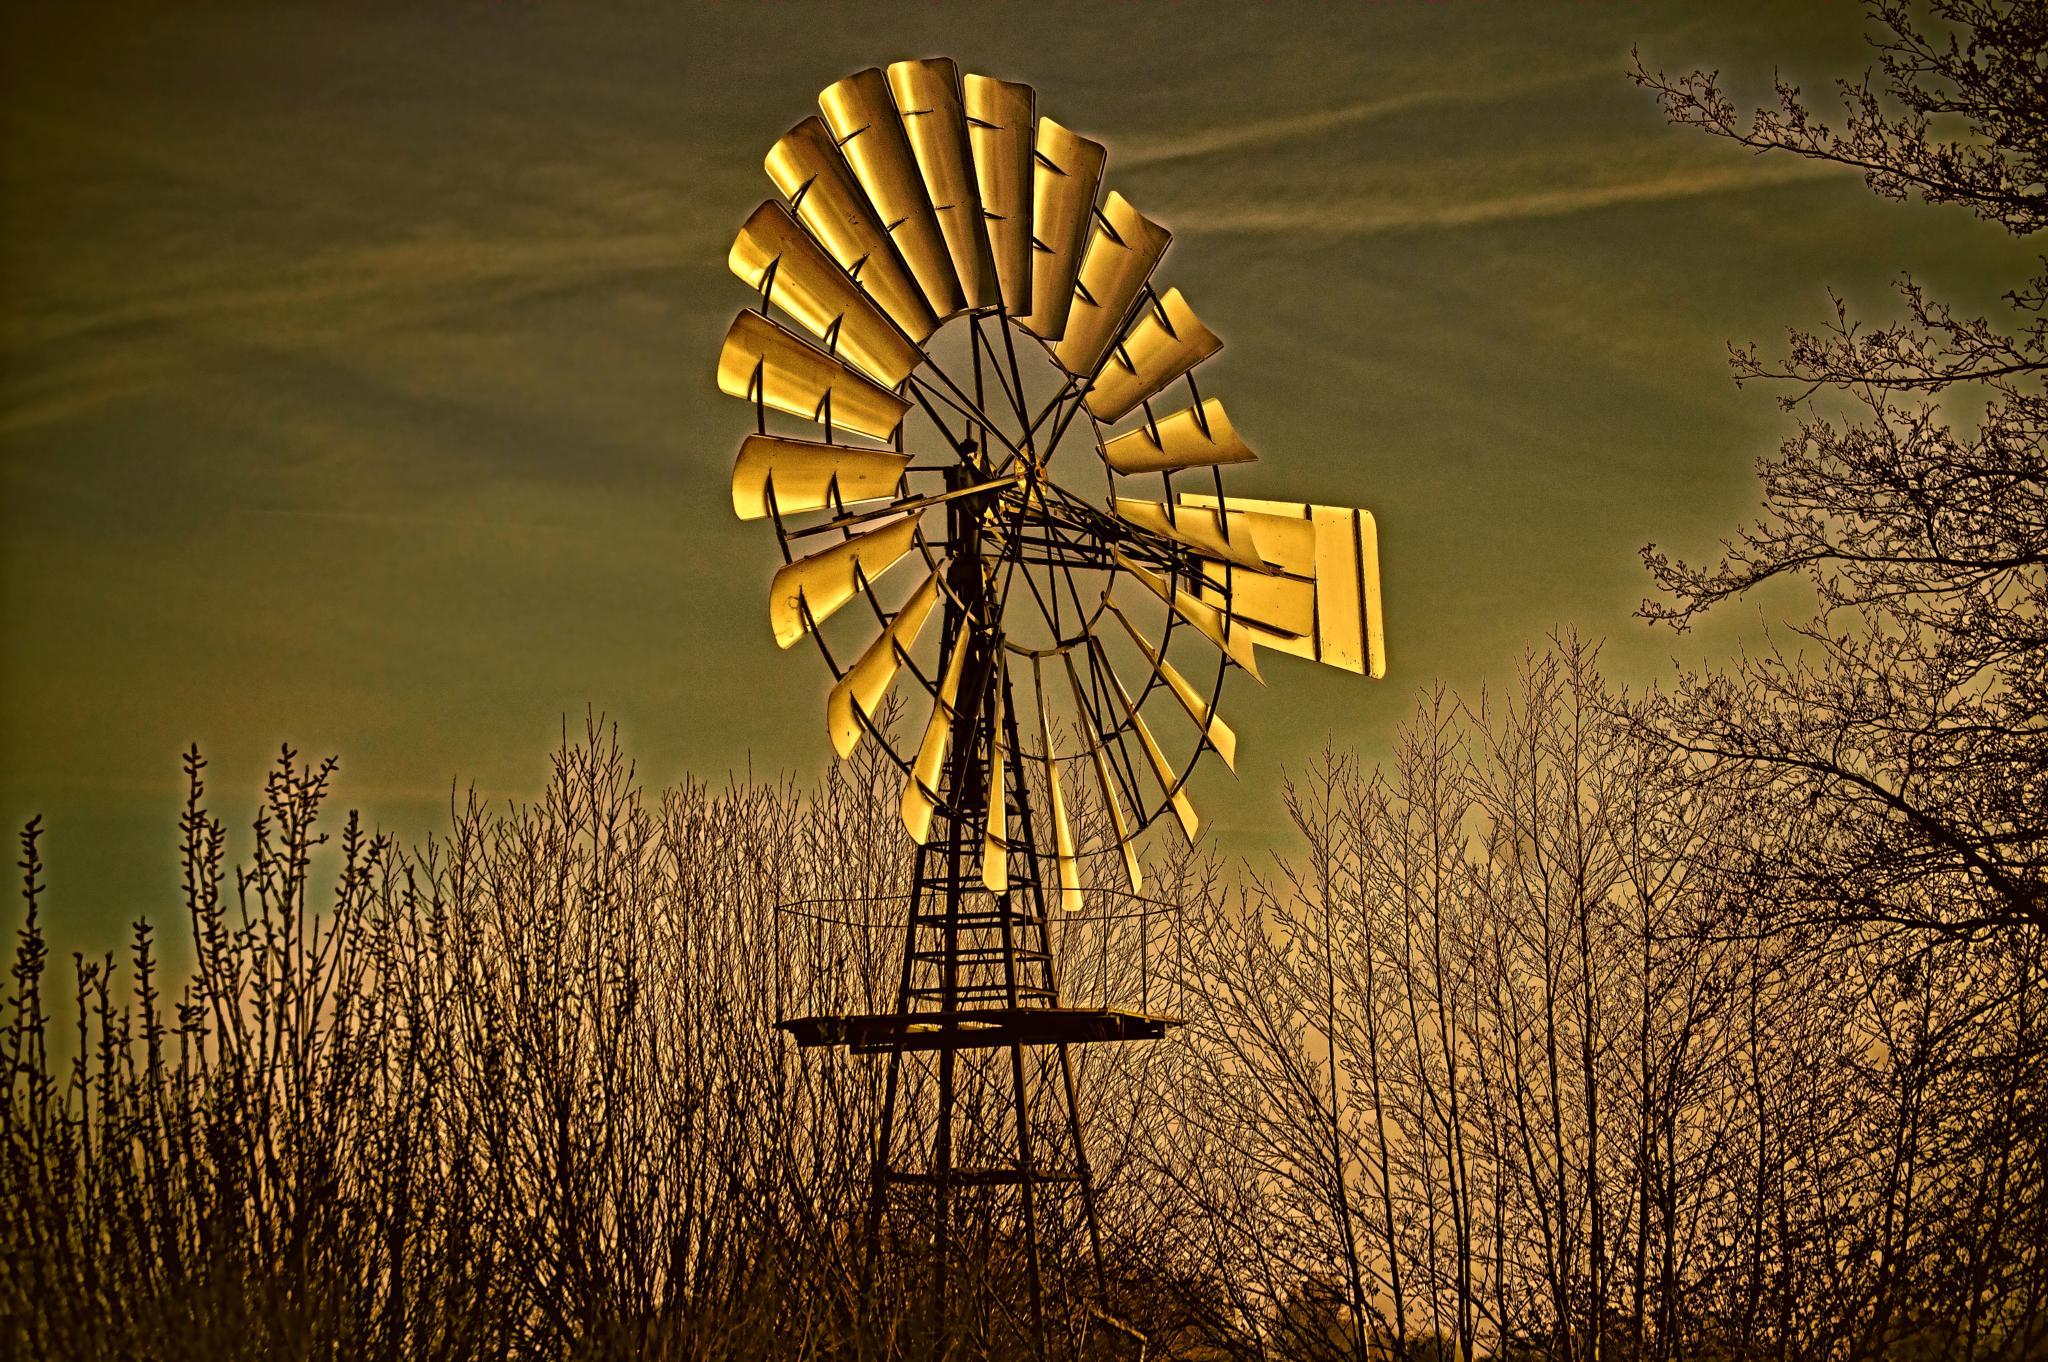 Dutch Country by Ensminger Art